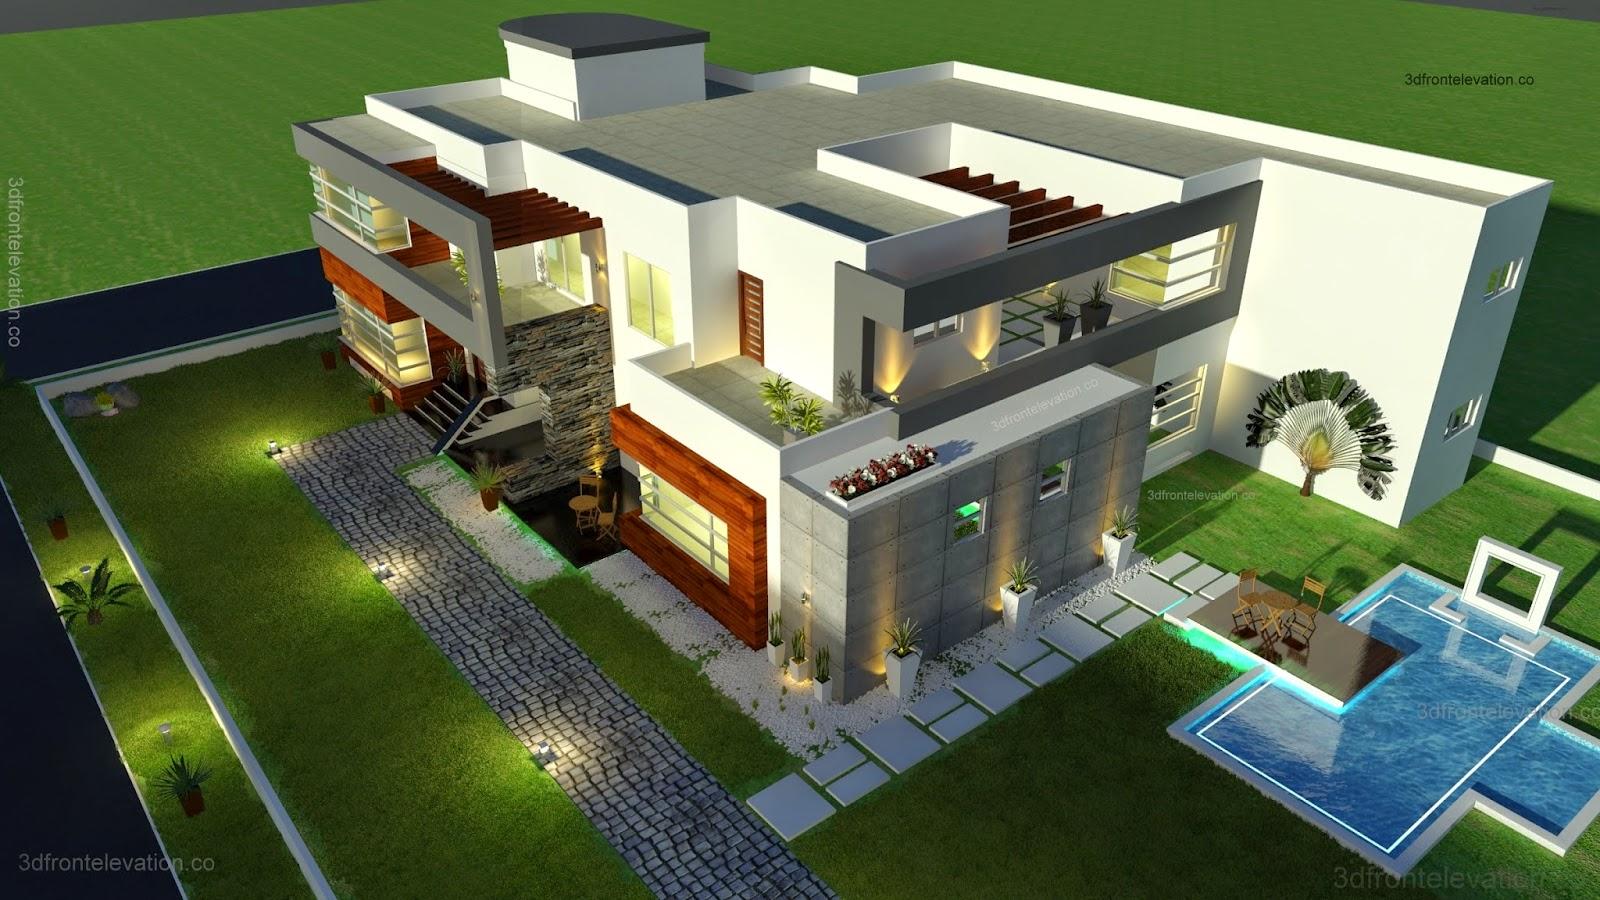 3D Front Elevation.com: 500 Square Meter Modern Contemporary House Plan Design 3d Front Elevation